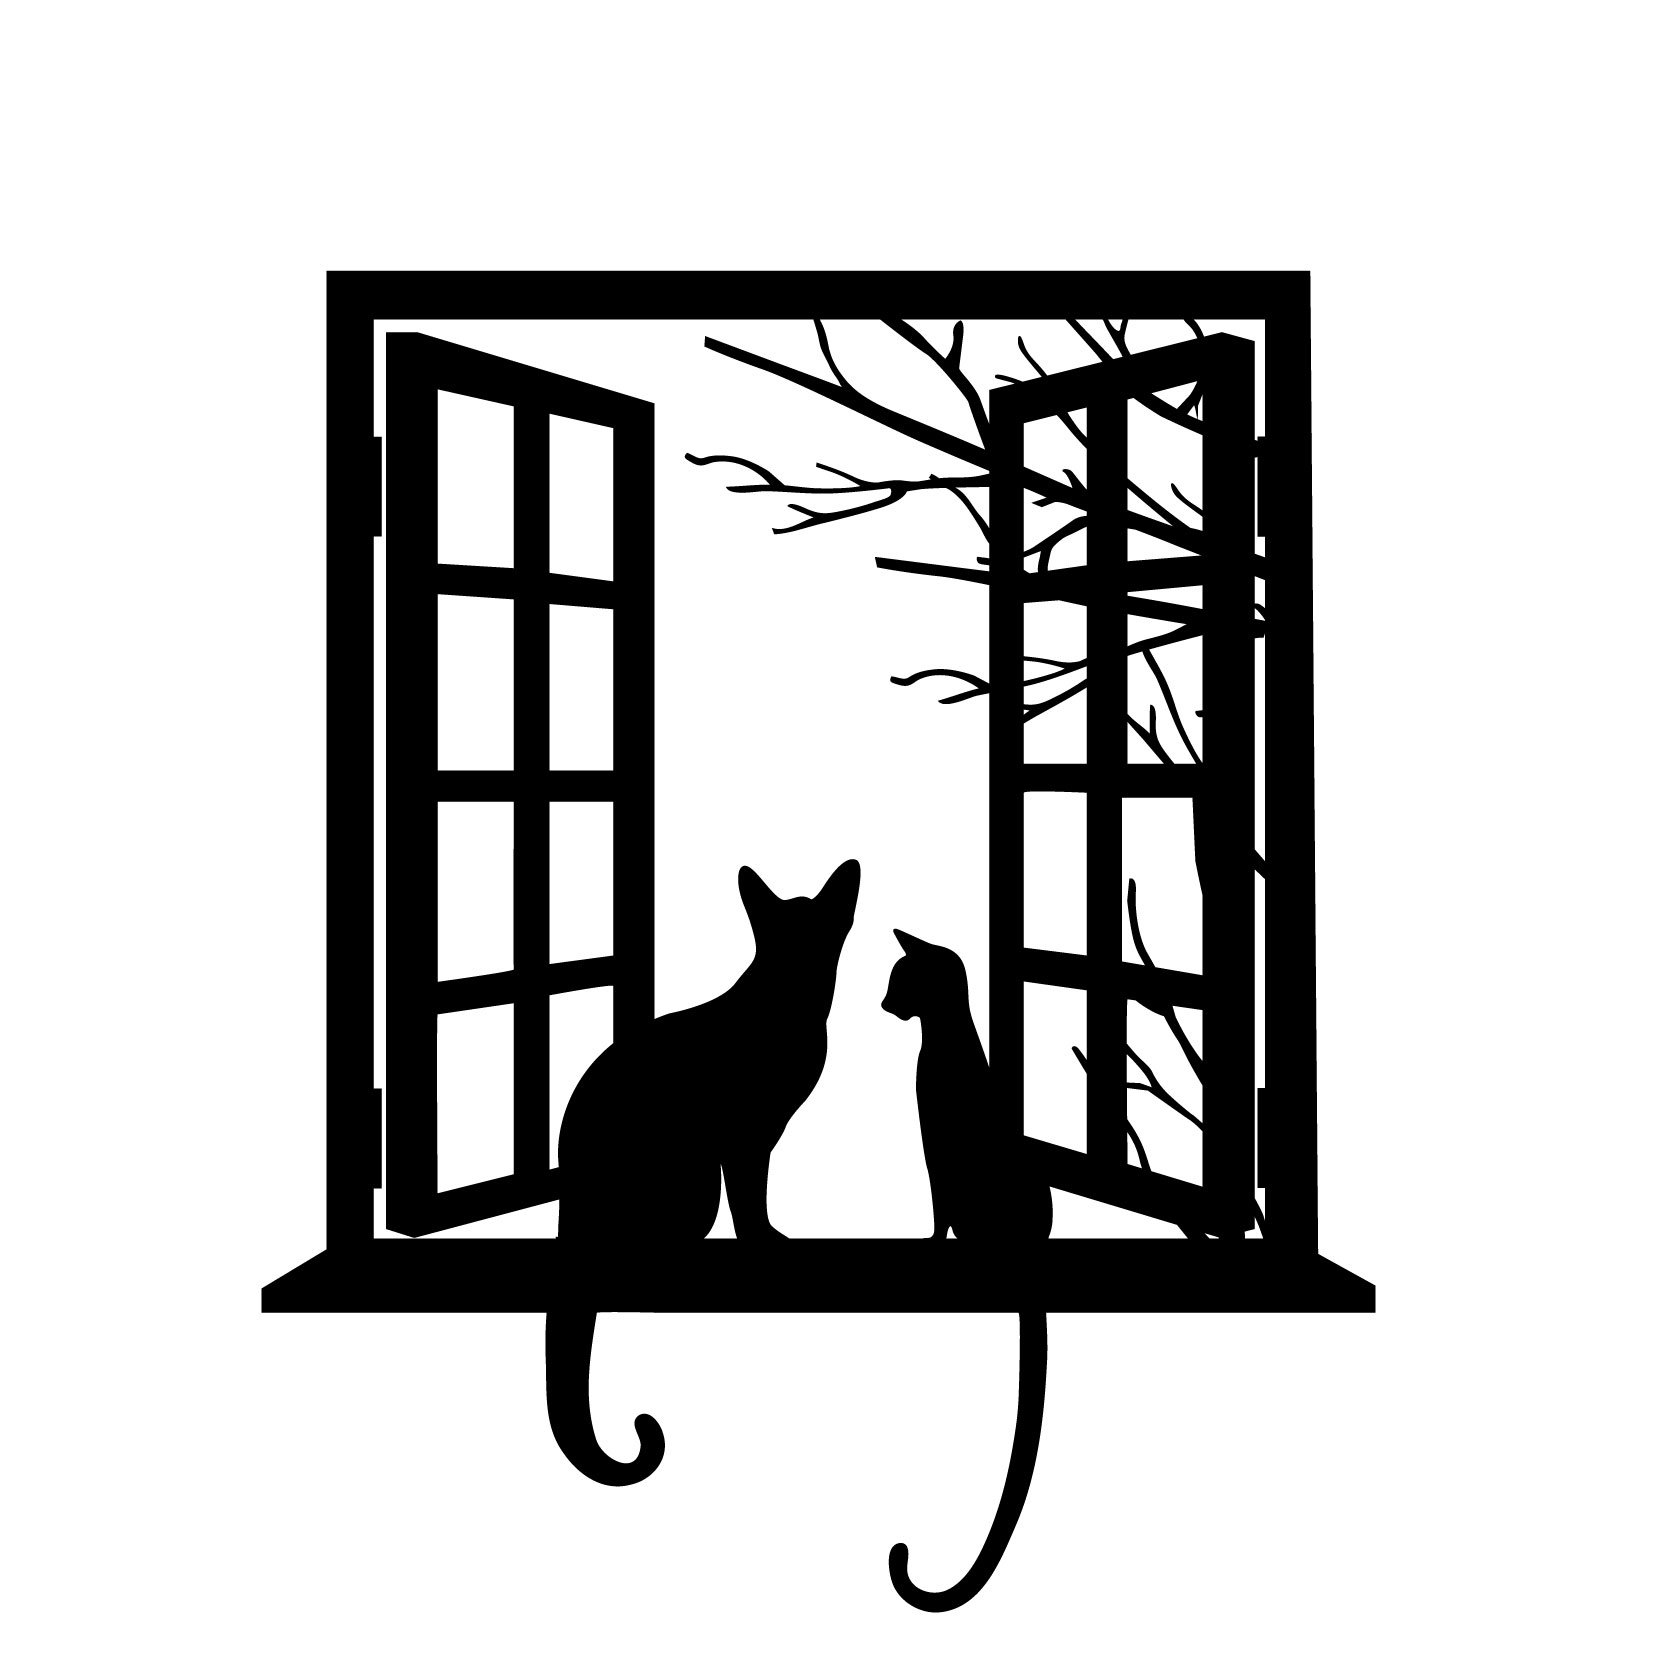 Cats Looking Through Window - Black - Vinyl Wall Art Decal for Homes, Offices, Kids Rooms, Nurseries, Schools, High Schools, Colleges, Universities, Events